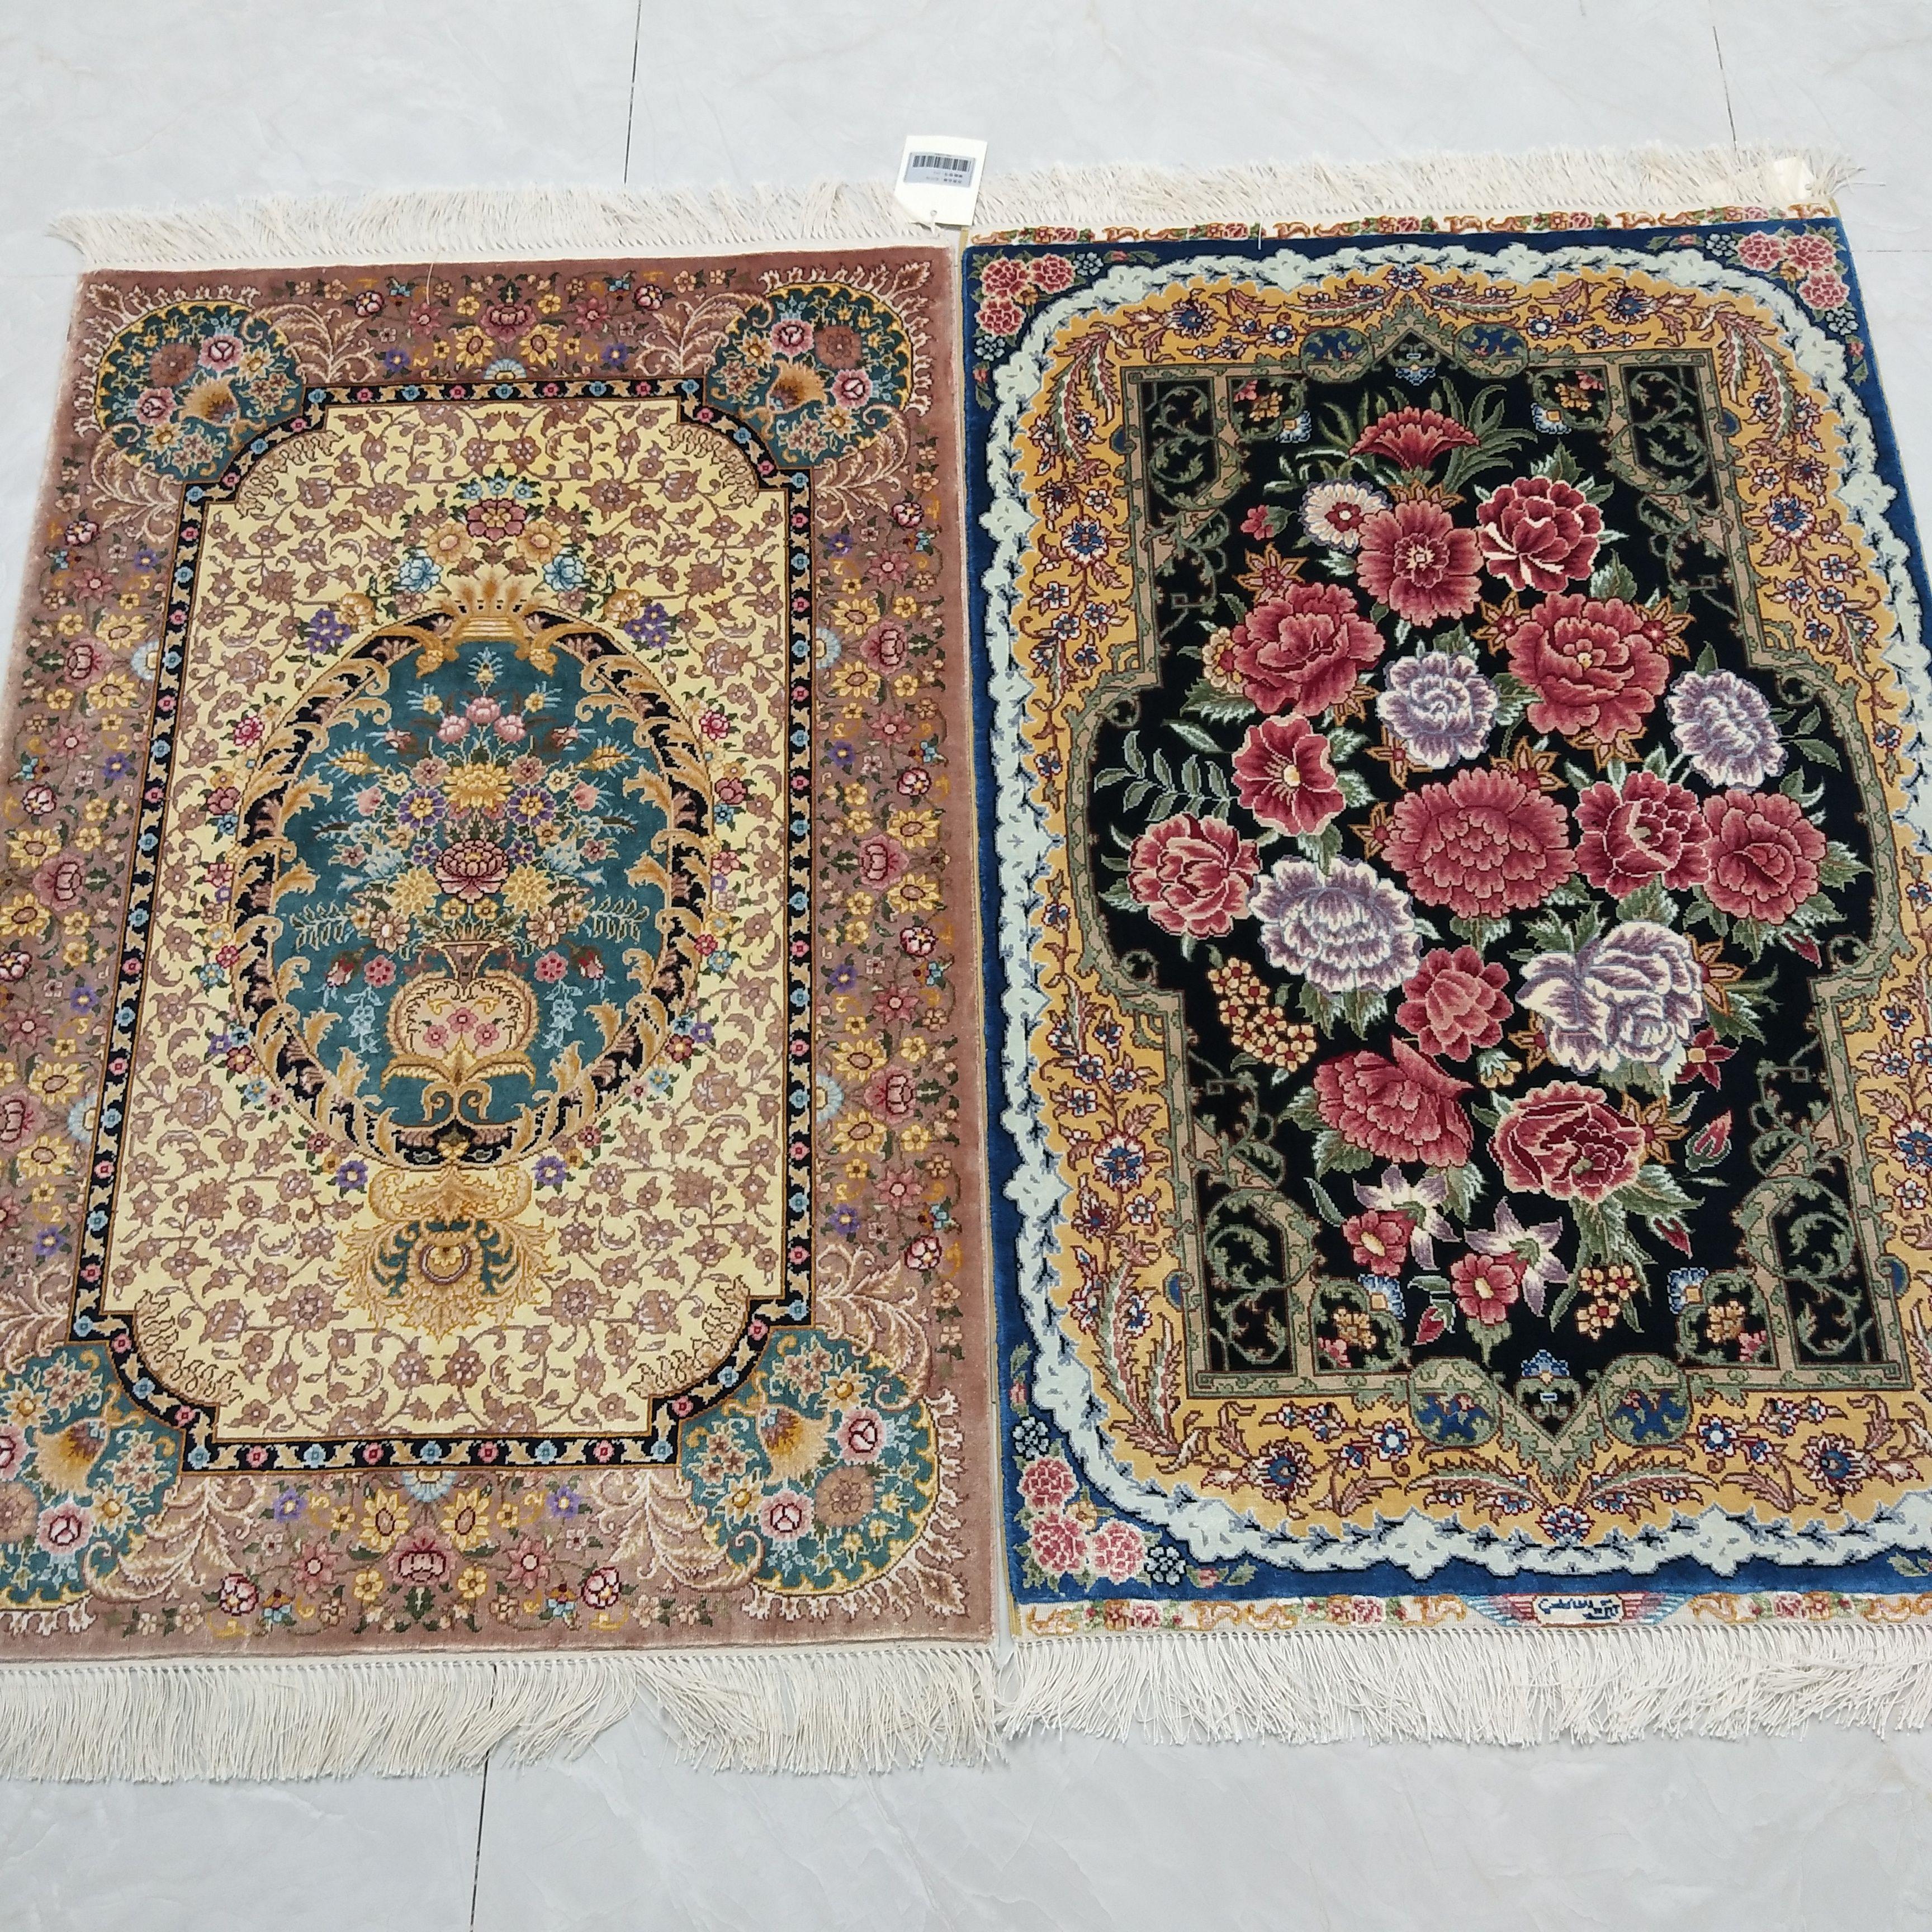 2x3ft handmade silk carpets Whatsapp:+86 185 6718 5850   carpets handmade silk   carpets handmade silk #carpets #handmaderugs #orientalcarpets #homedecoration #persiancarpet #silkcarpetsfactory #prayerrugs #persianrug #turkishcarpet #tabrizdesigns #turkishdesigns #kermandesign #silkcarpets #handknotted